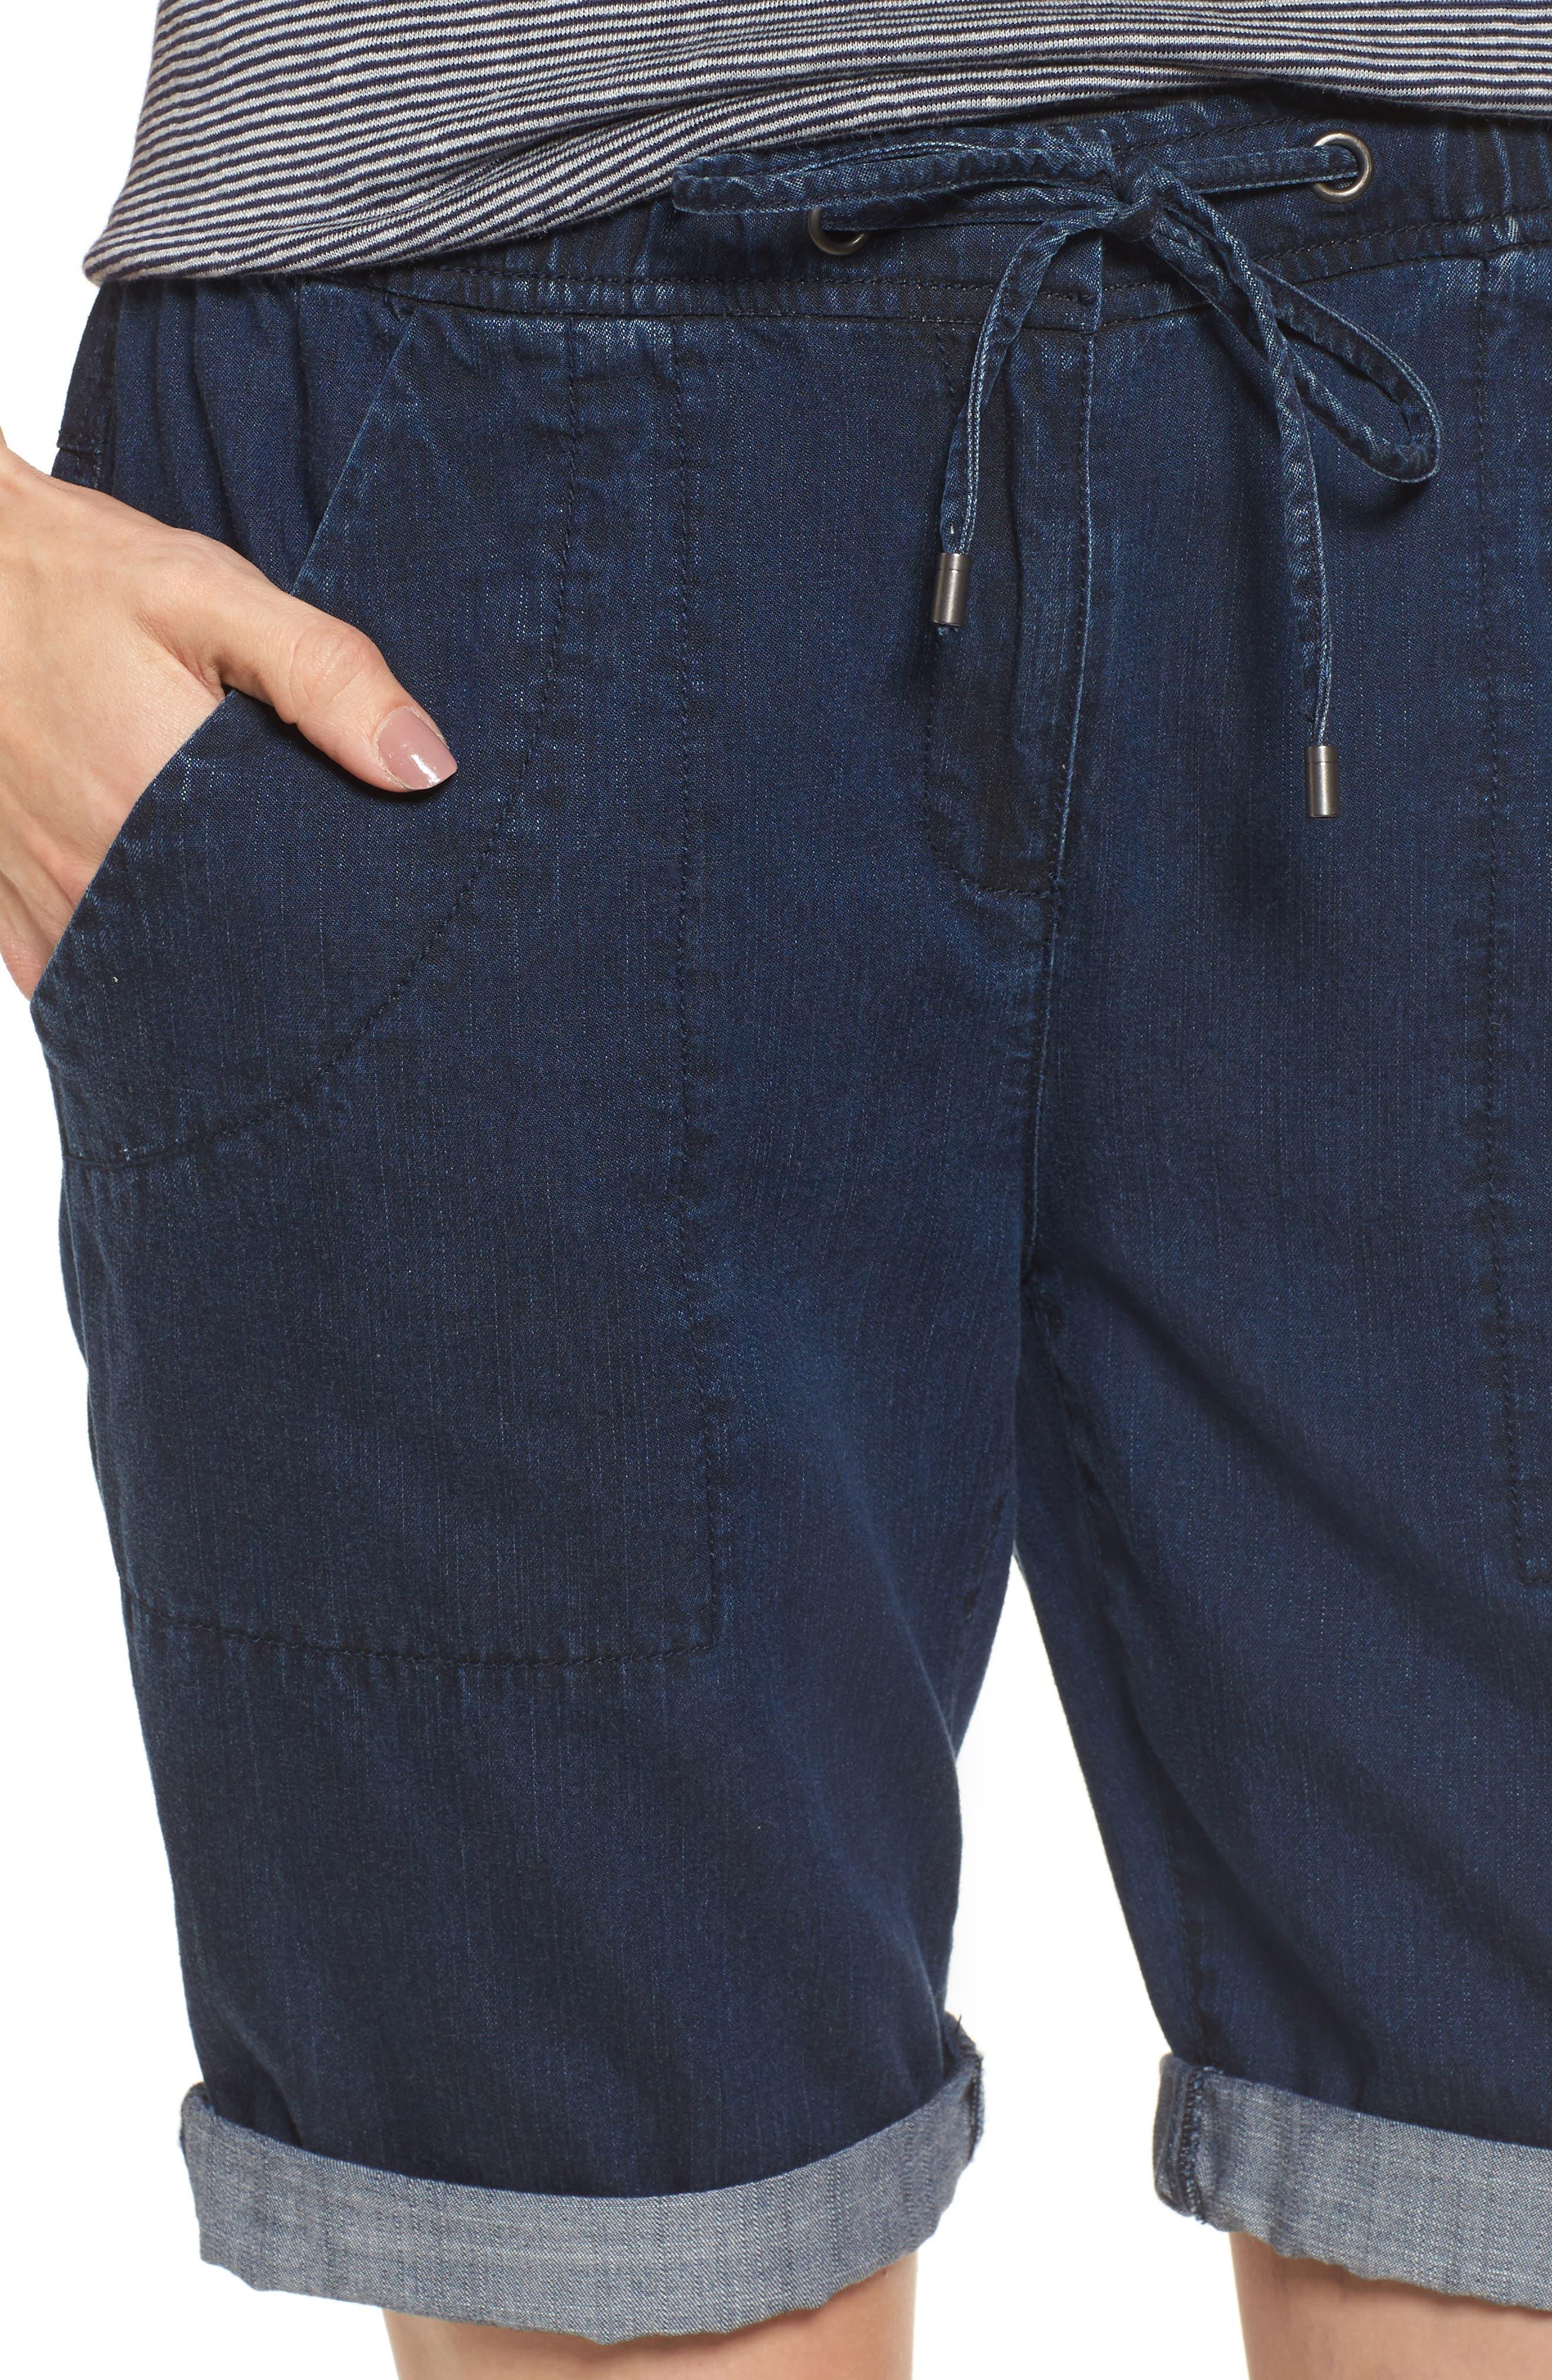 Tencel<sup>®</sup> Lyocell & Organic Cotton Walking Shorts,                             Alternate thumbnail 4, color,                             419